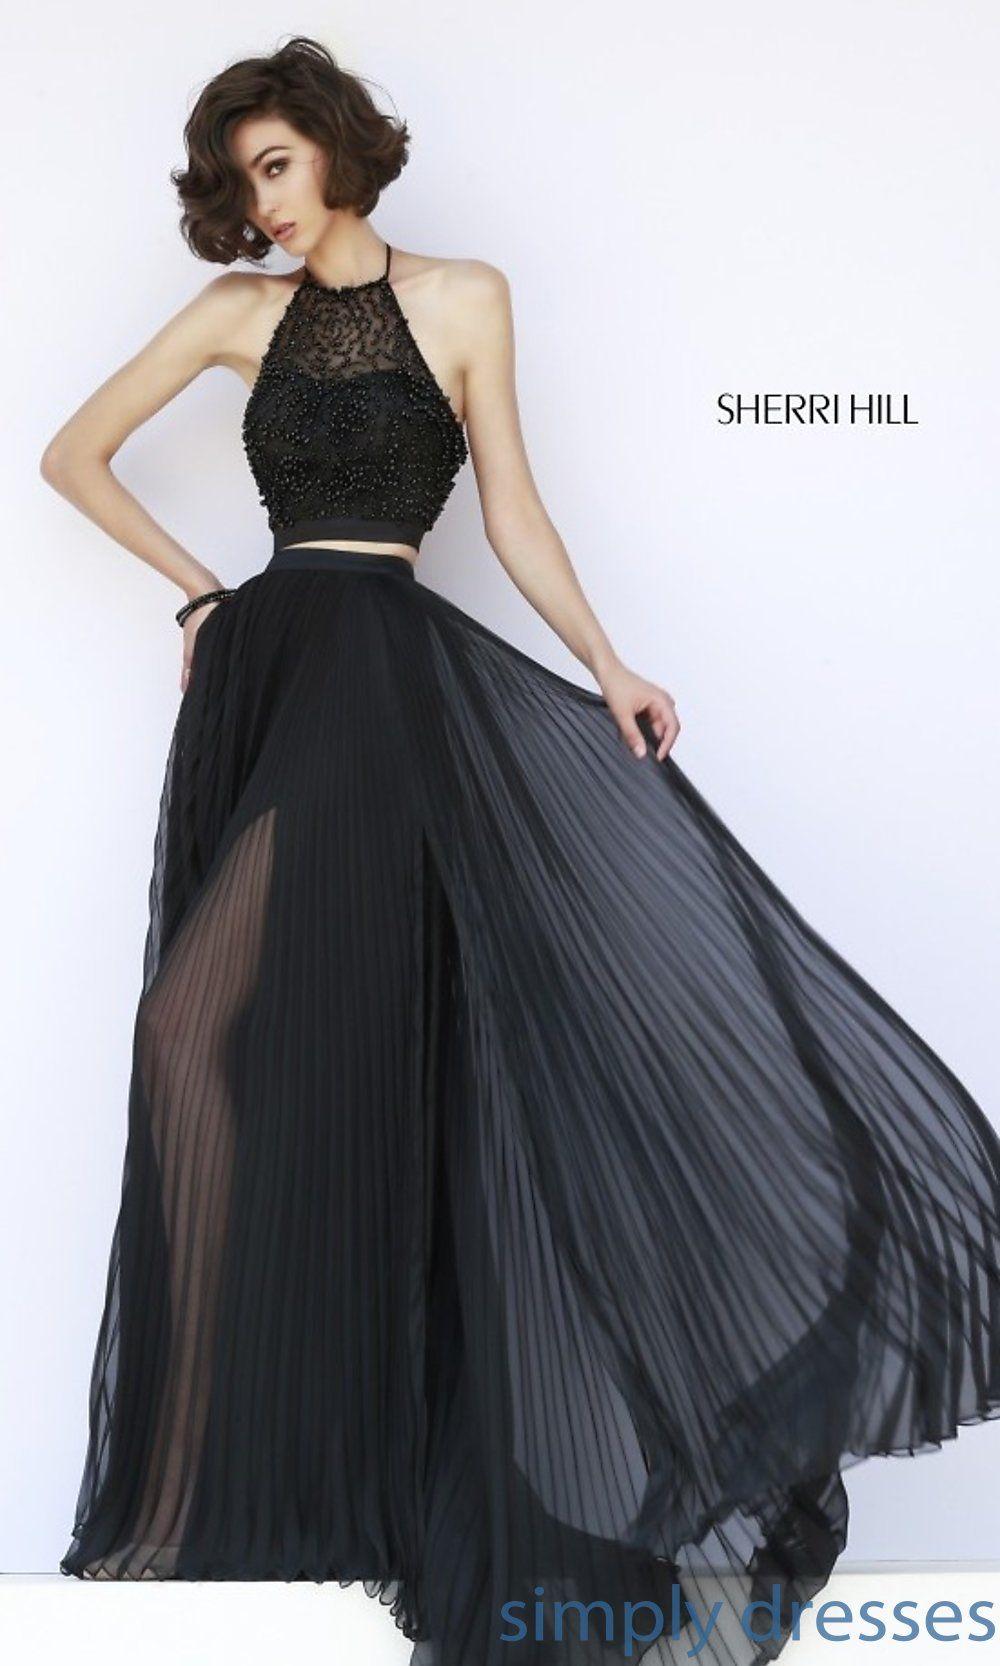 Sherri hill twopiece black pleated long gown fashion pinterest